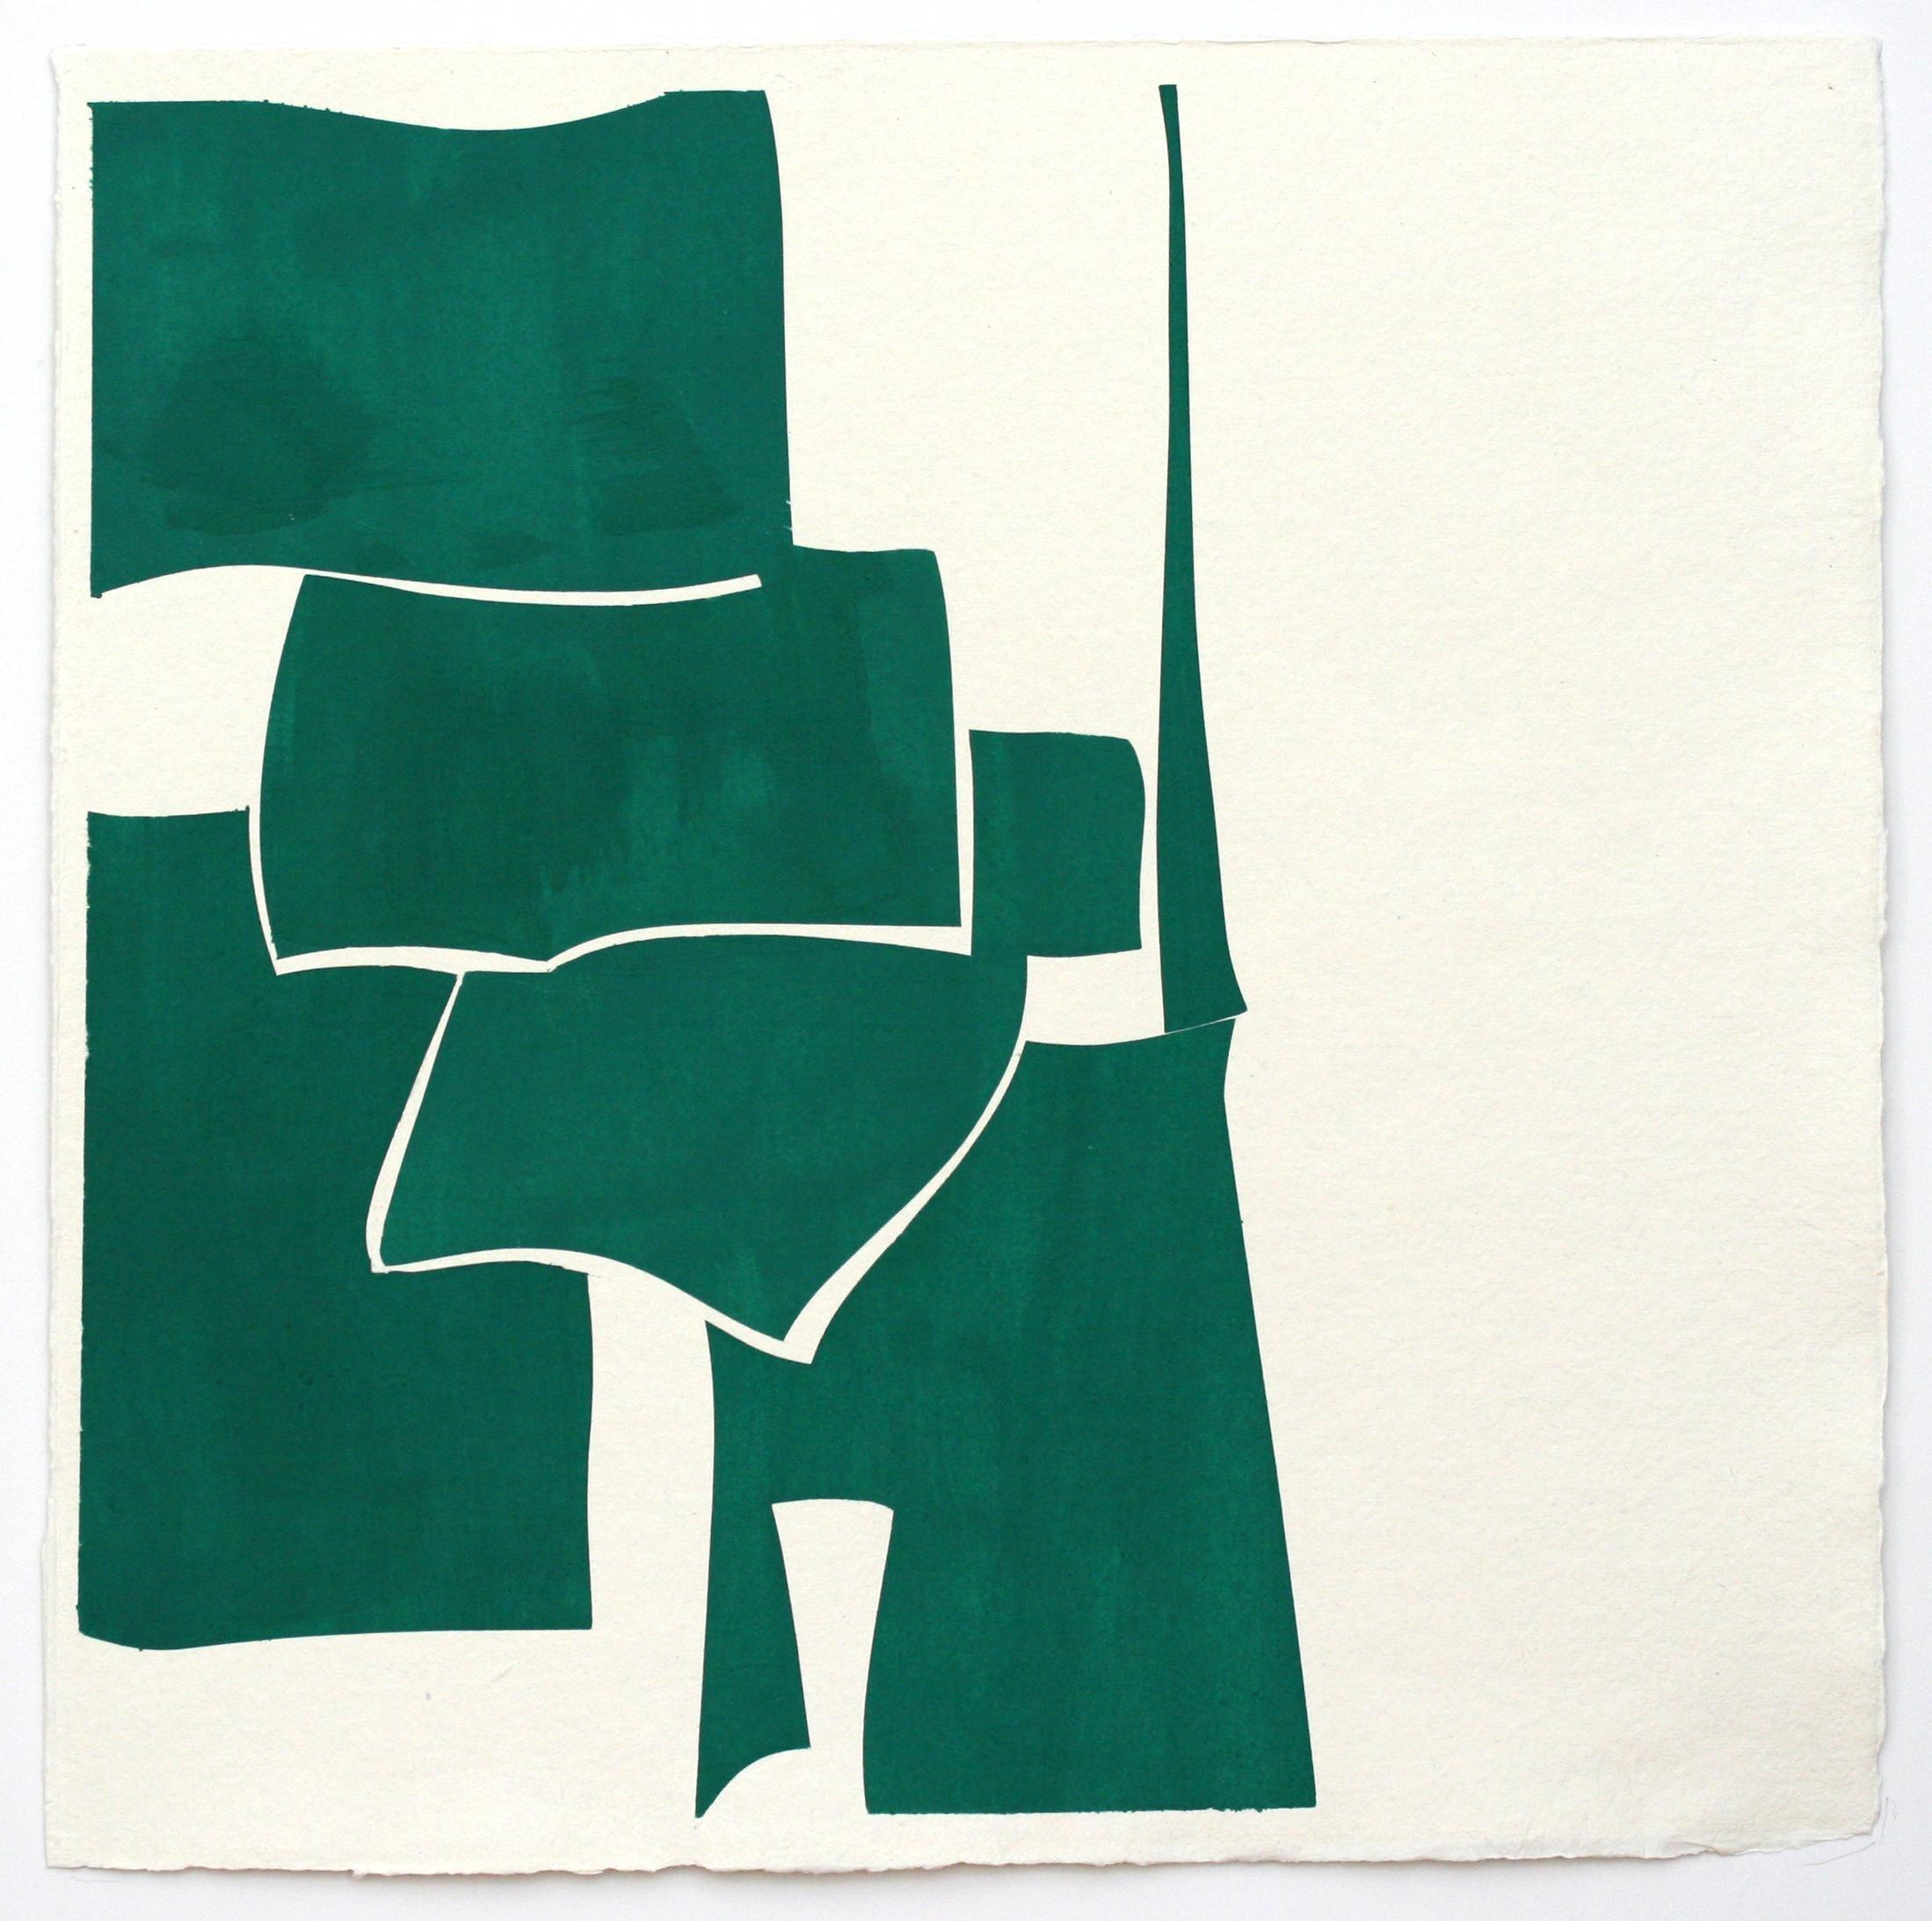 Summer H- framed geometric green gouache on handmade paper by Joanne Freeman